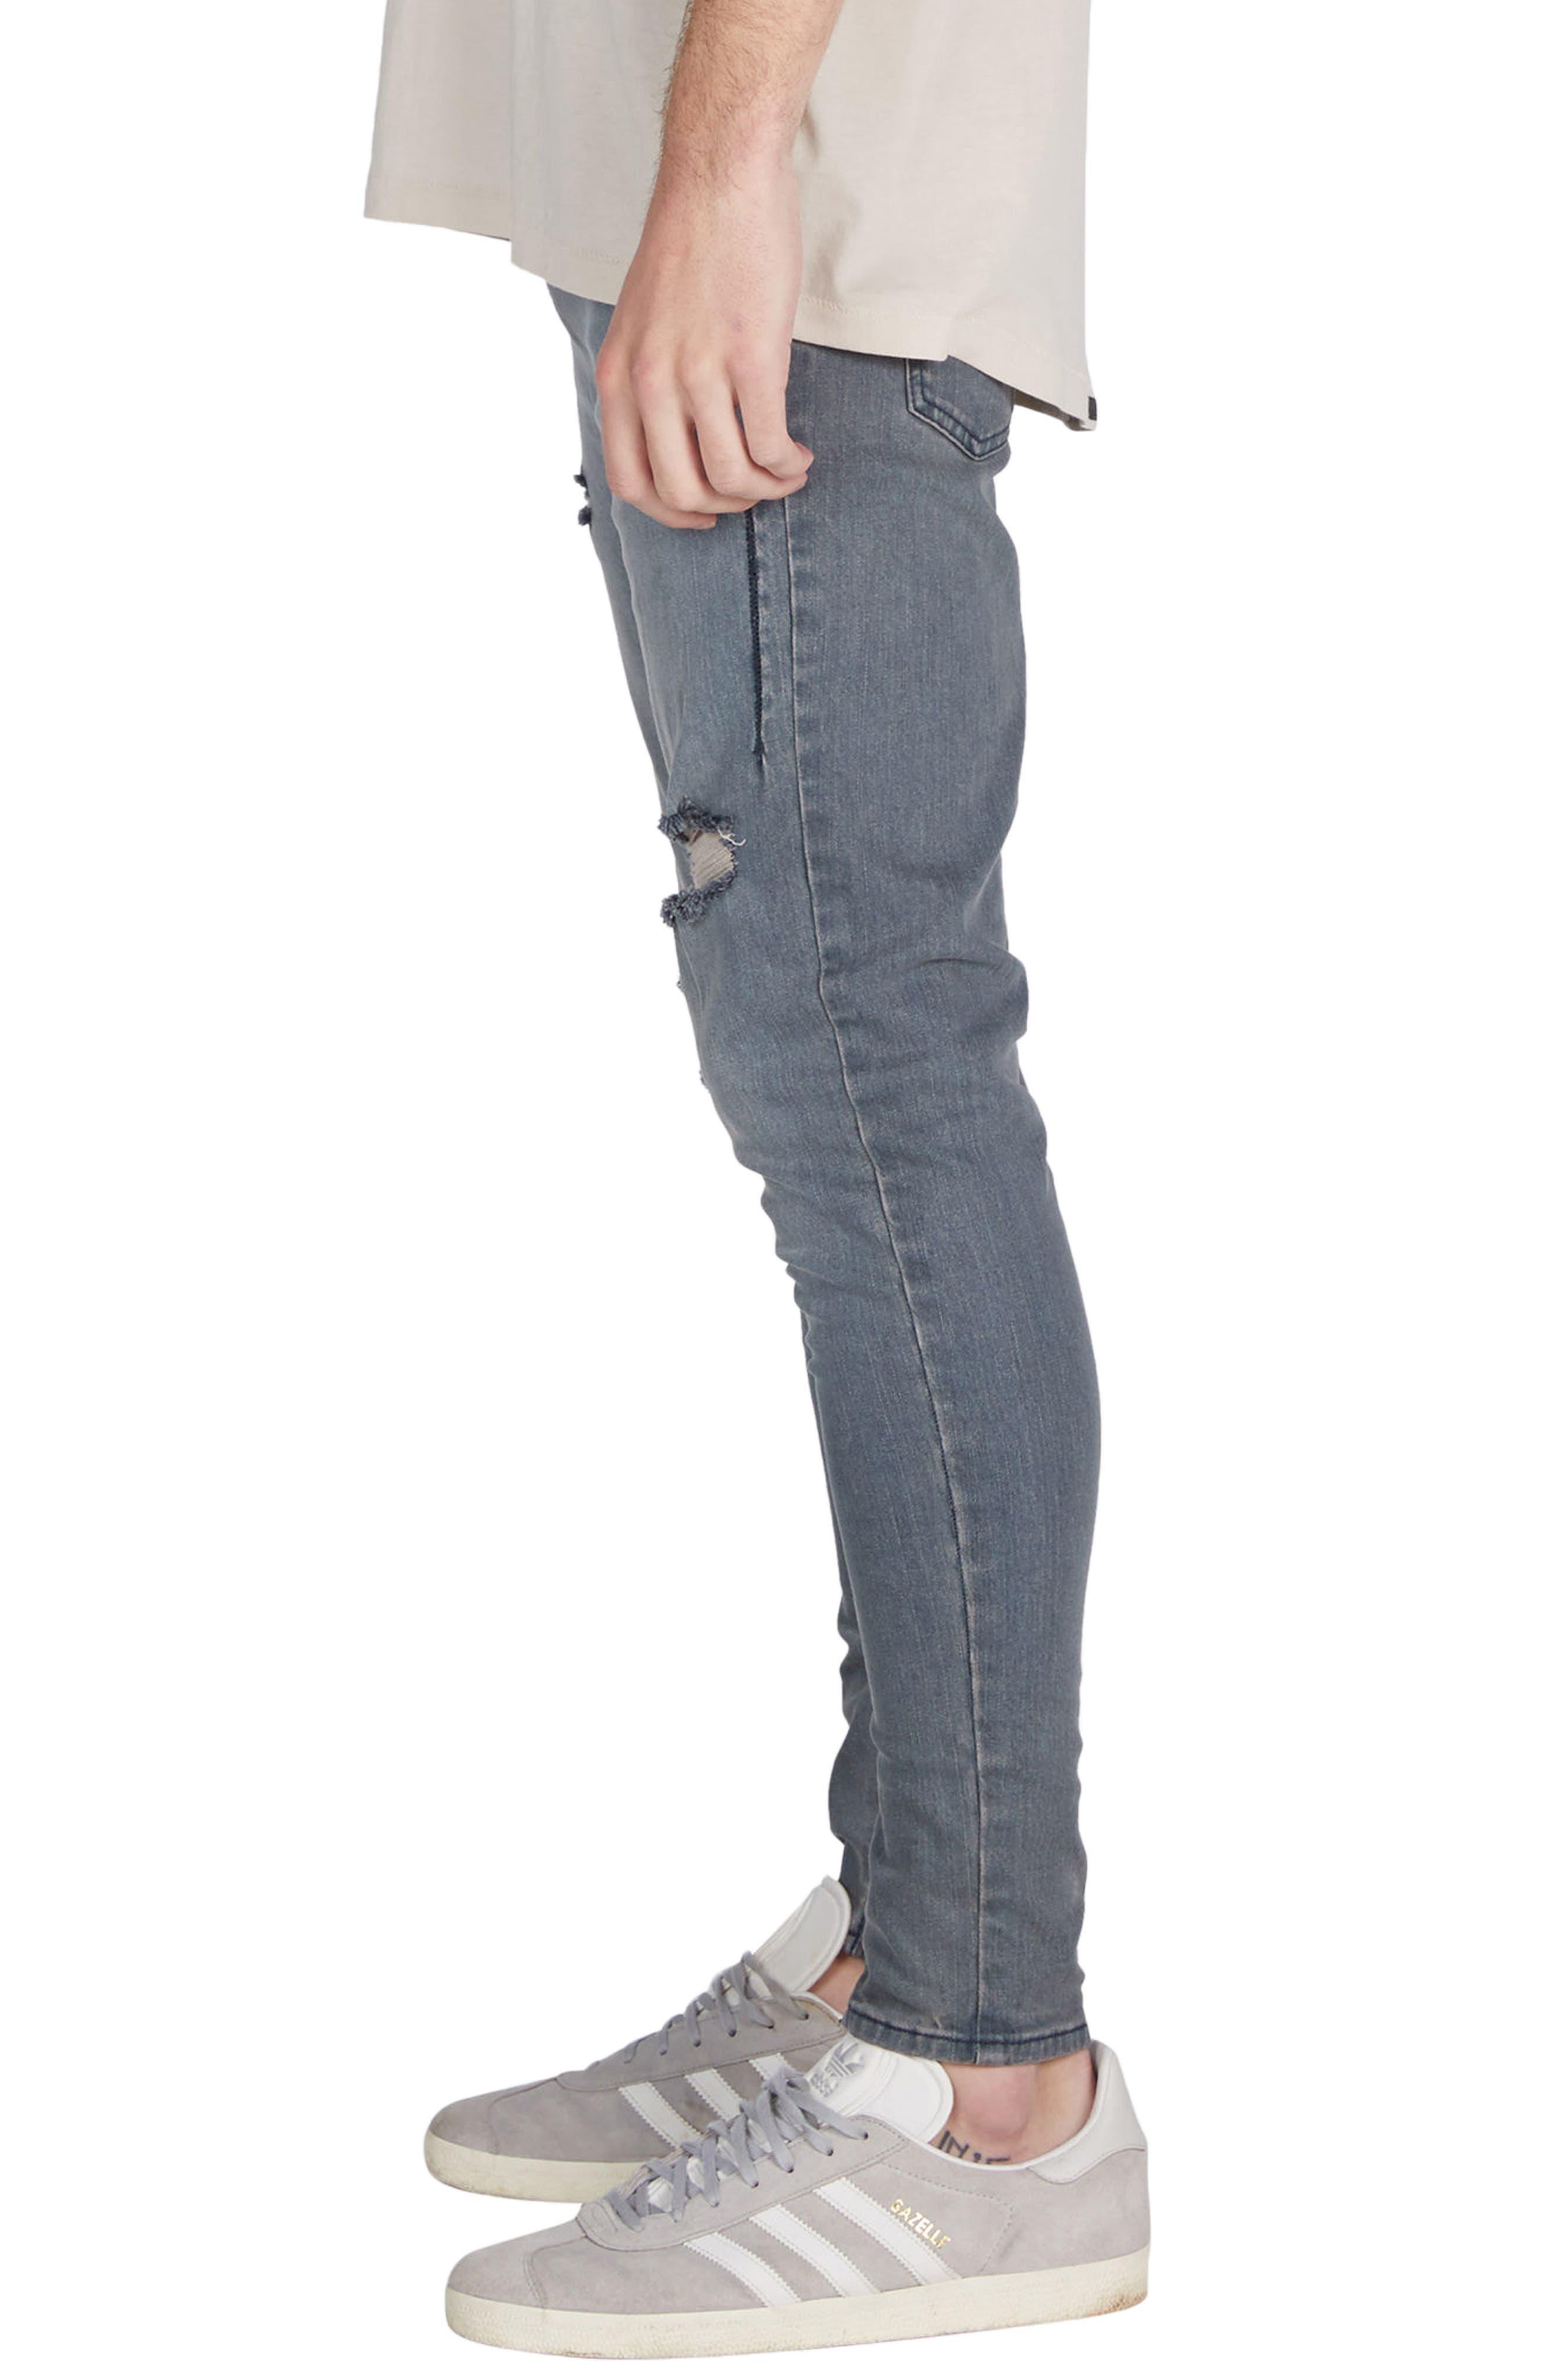 Sharpshot Slouchy Skinny Fit Denim Pants,                             Alternate thumbnail 3, color,                             Blue Grey